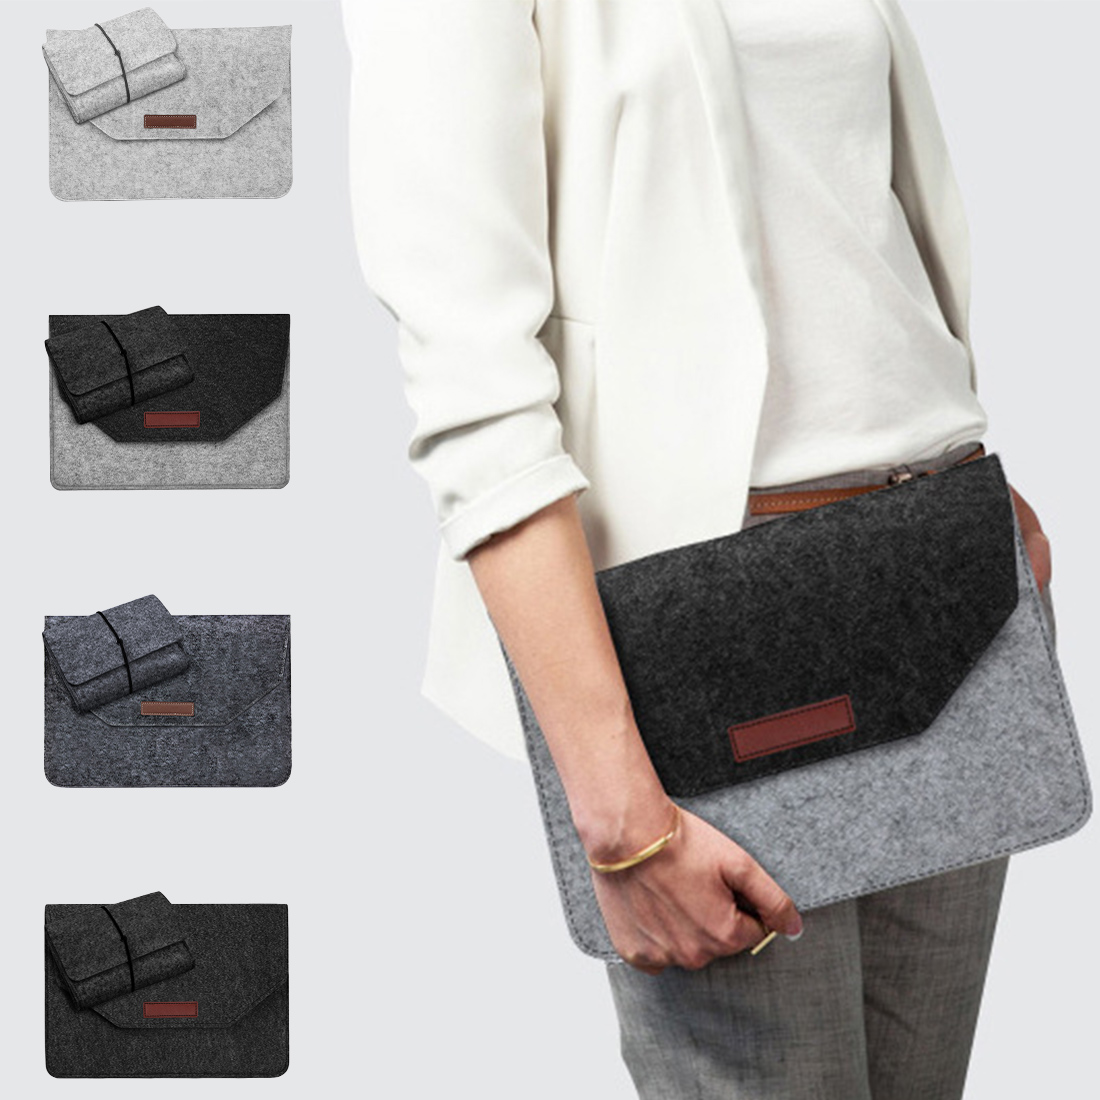 Soft Laptop Bag Case For Macbook Air Pro Retina 11  13 15'' Inch Laptop Anti-scratch Cover For Mac Book